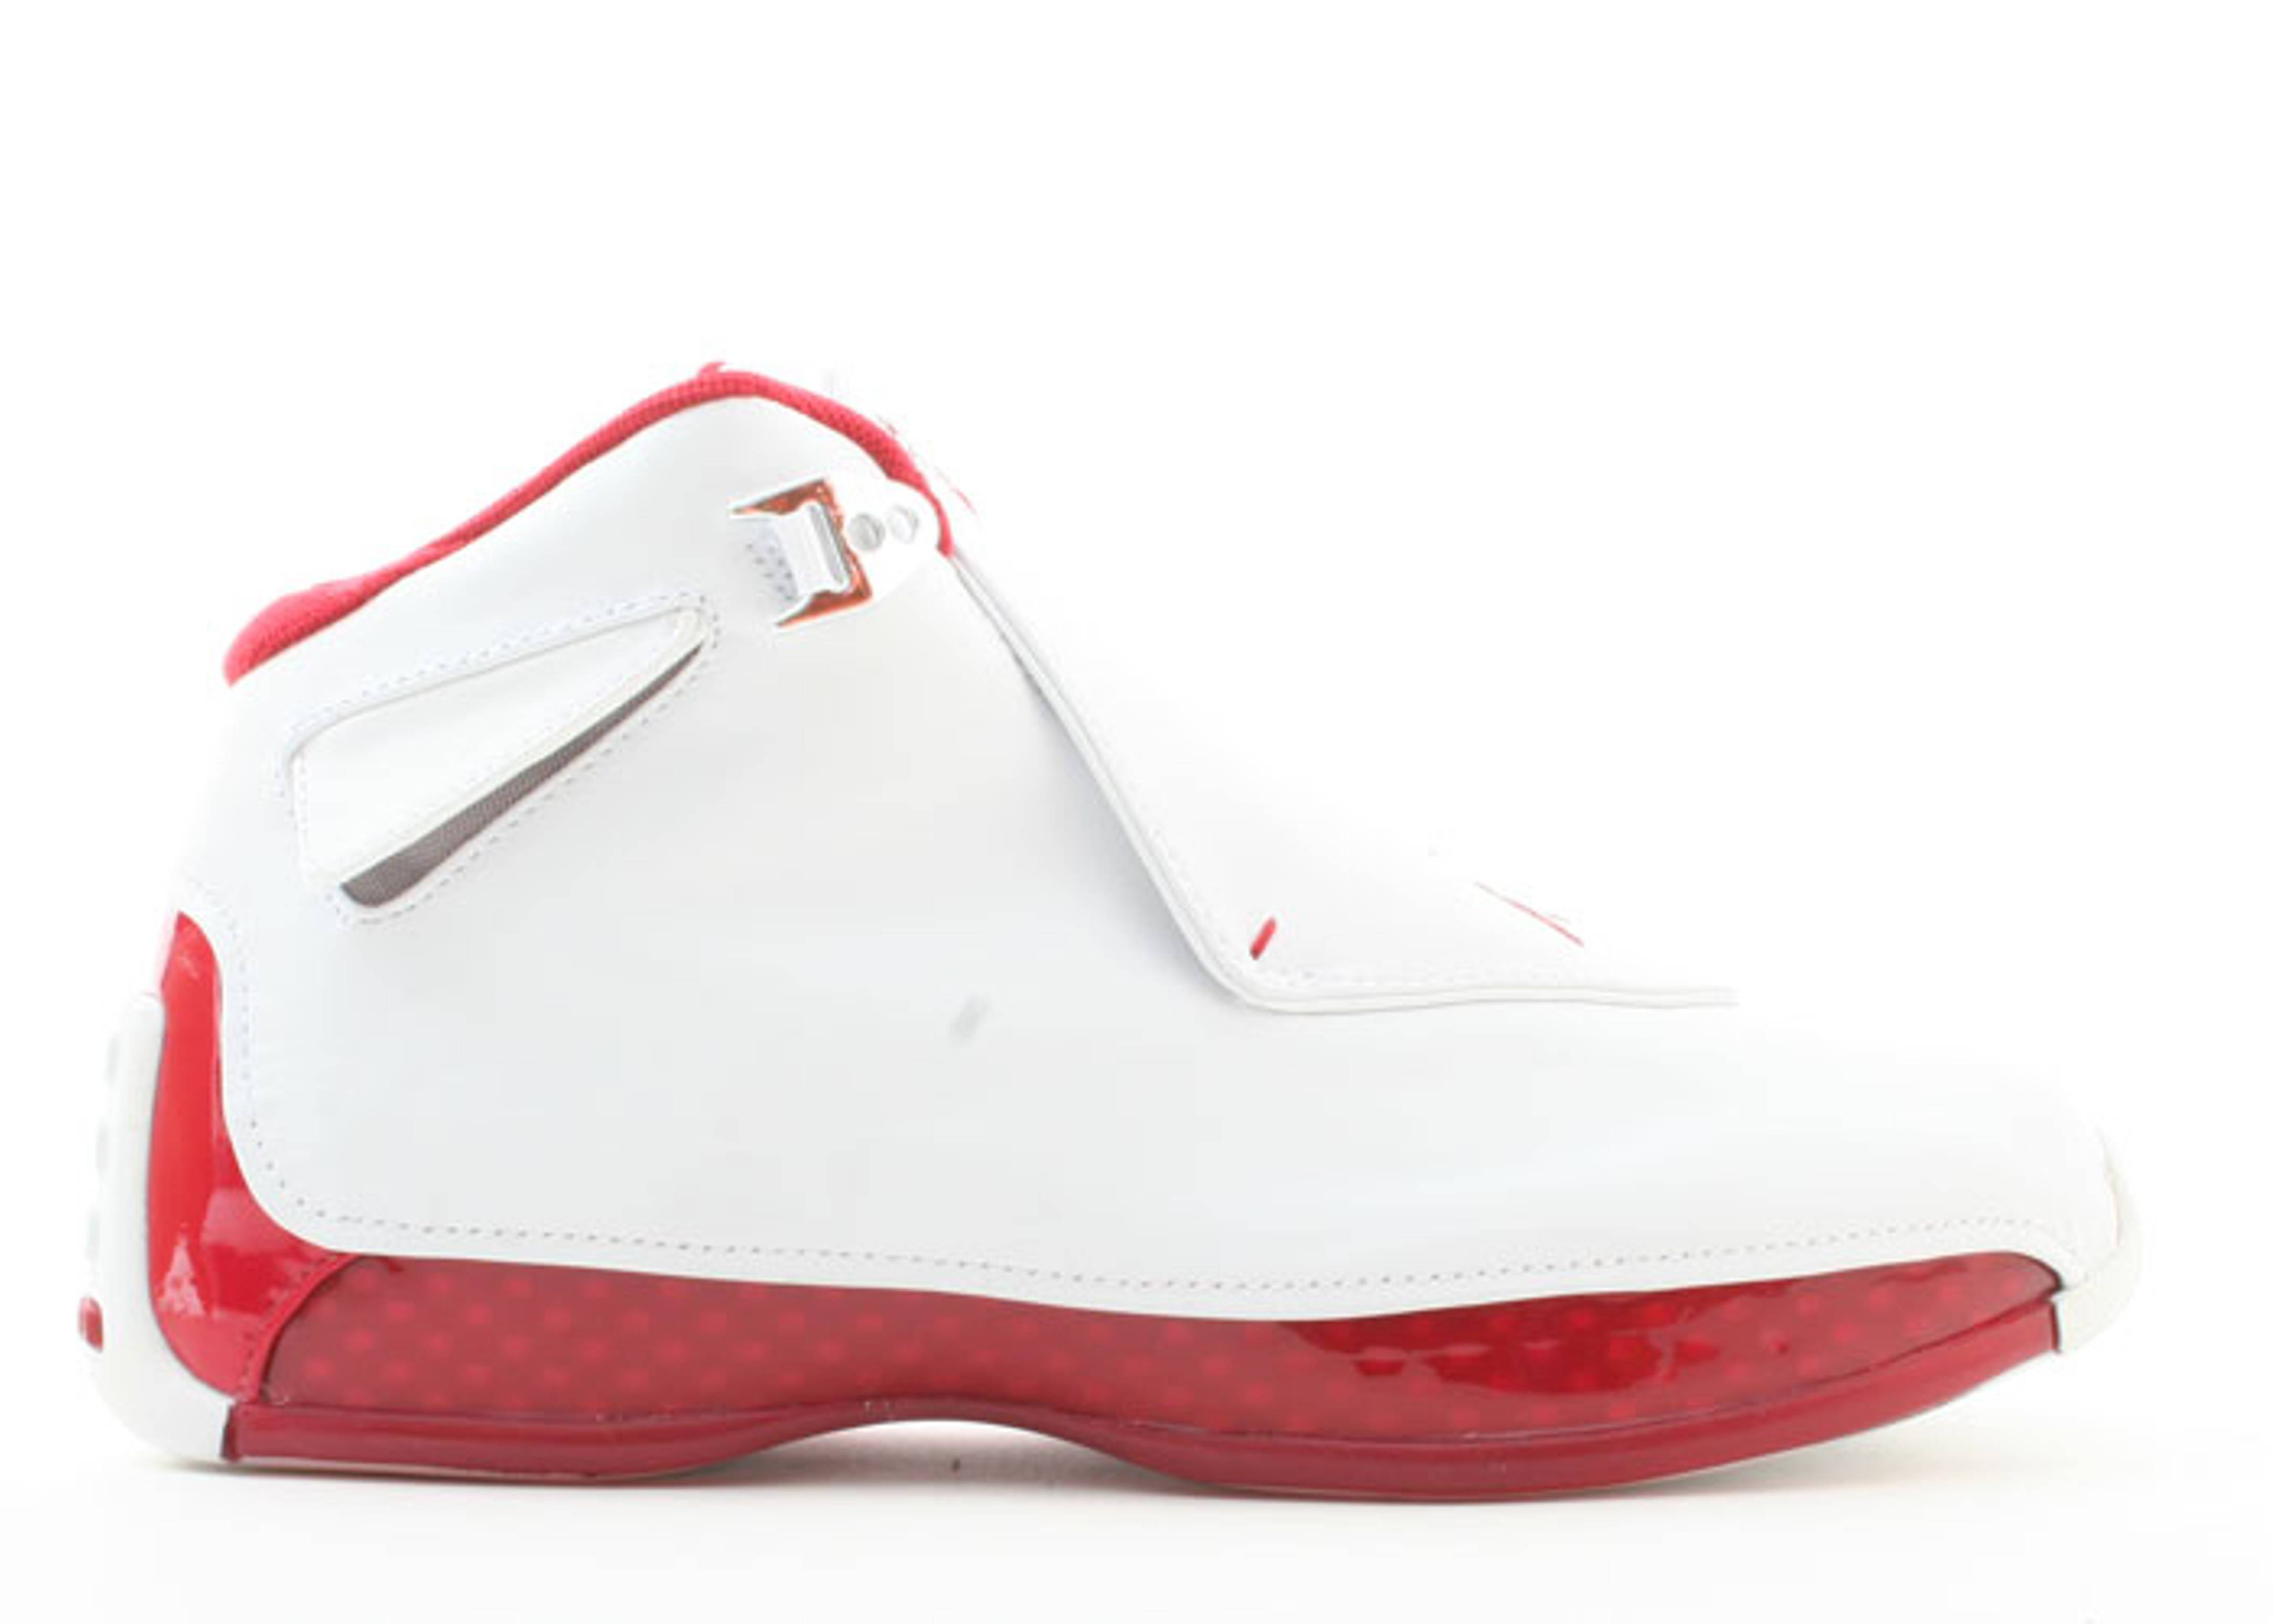 cea904fc199719 Air Jordan 18 - Air Jordan - 305869 161 - white varsity red